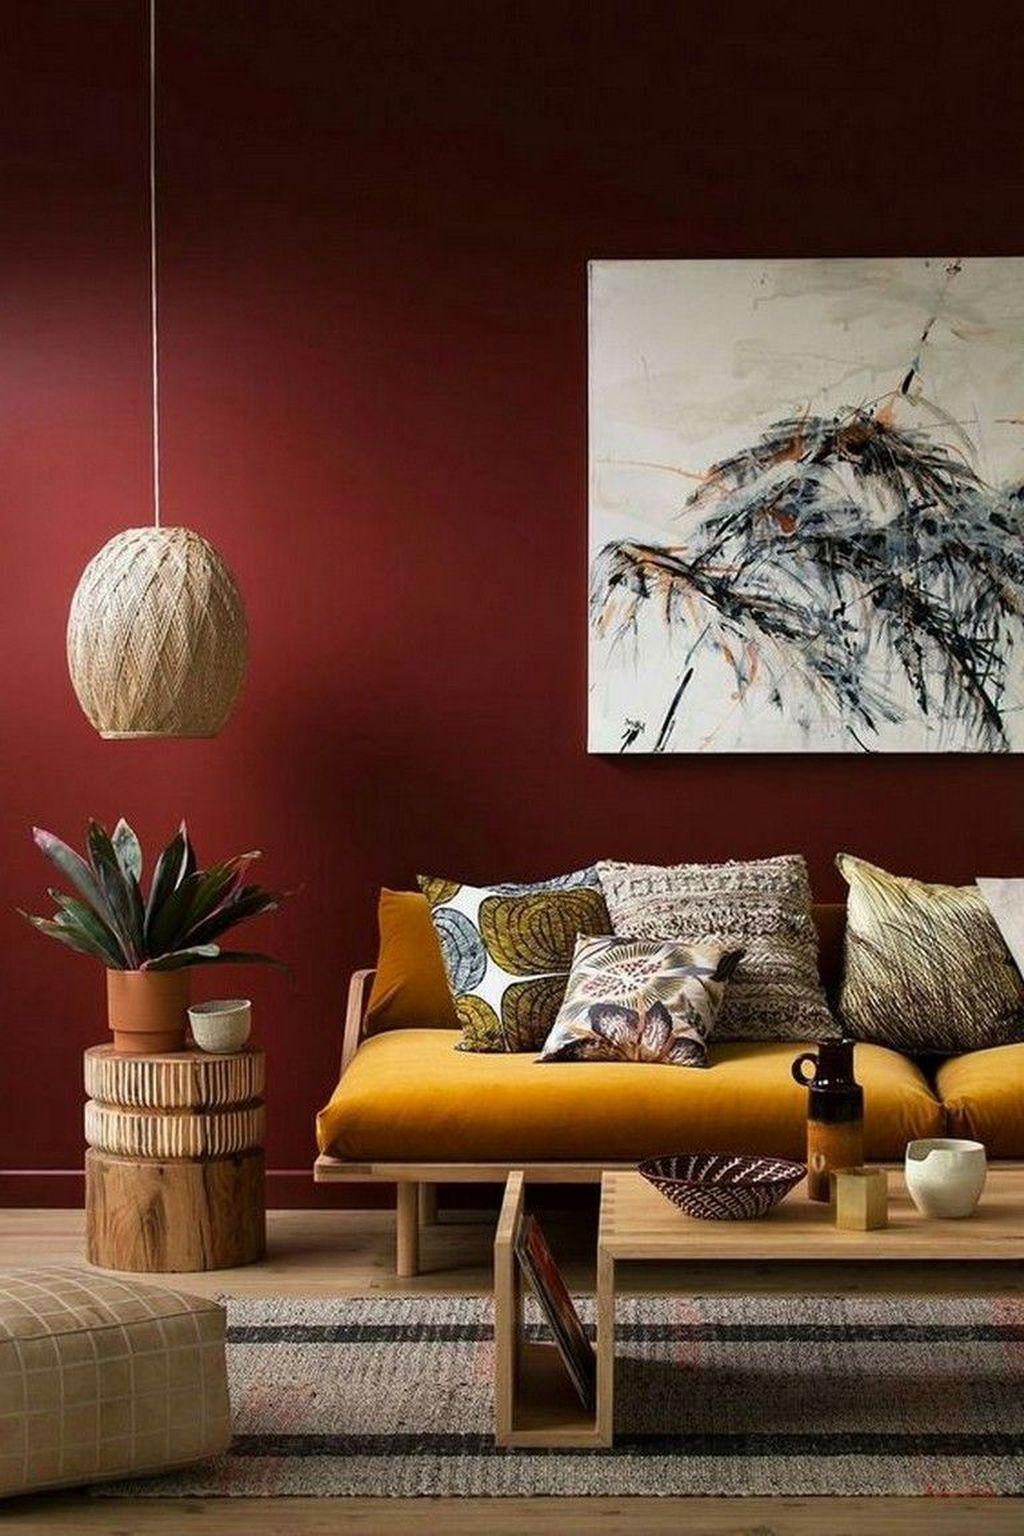 Charming Yellow Interior Design Ideas Best For Summer 04